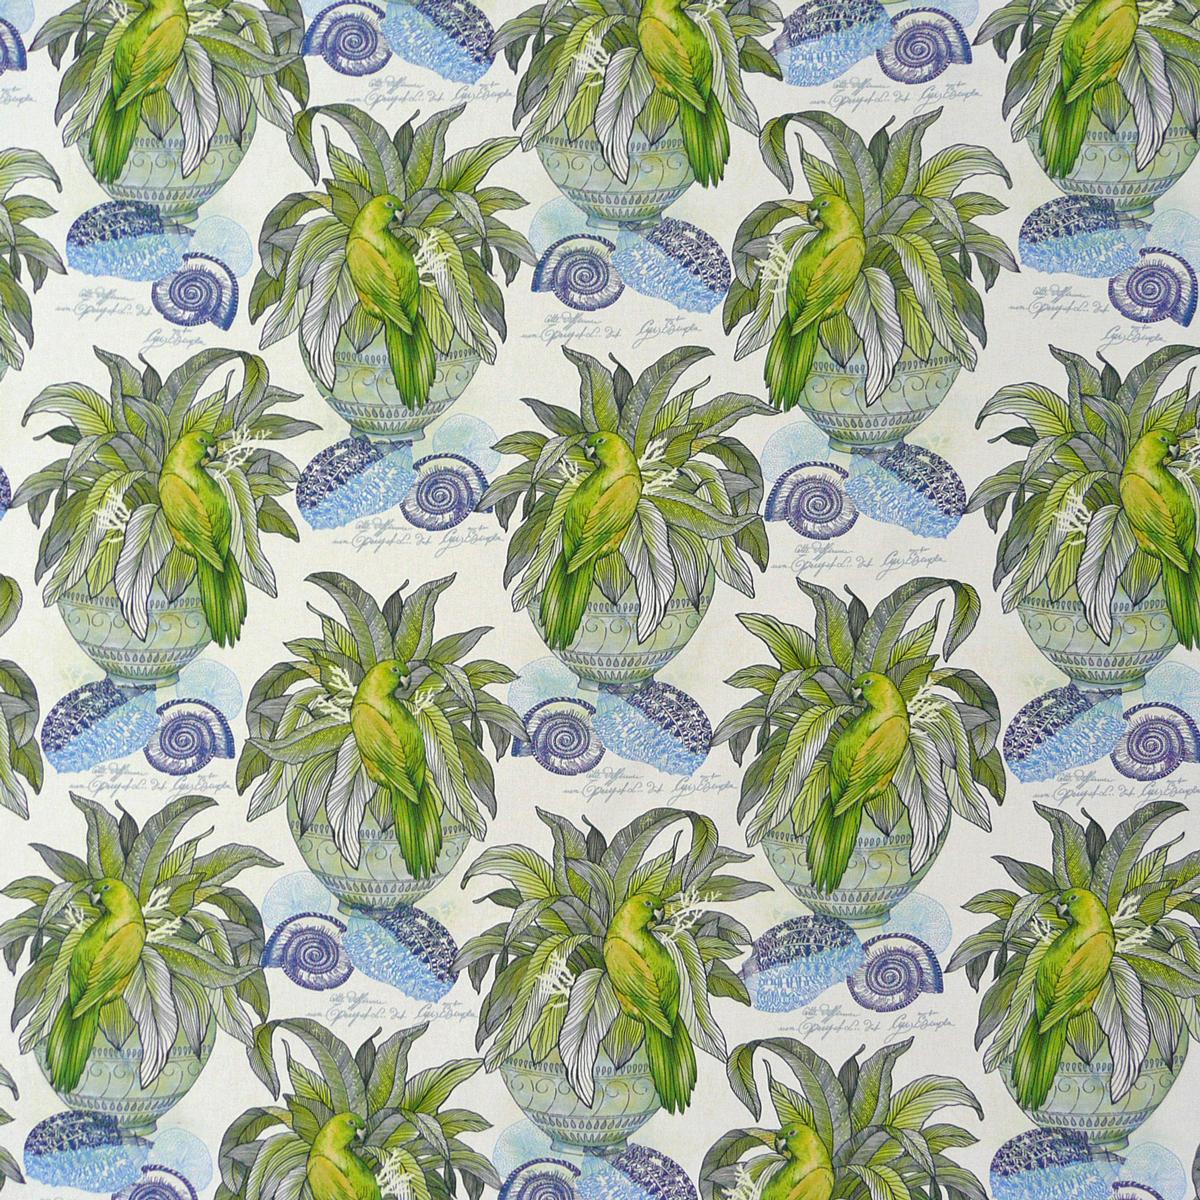 dekostoff pflanze vogel muschel wei blau gr n alle stoffe stoffe gemustert stoff tiermotive. Black Bedroom Furniture Sets. Home Design Ideas